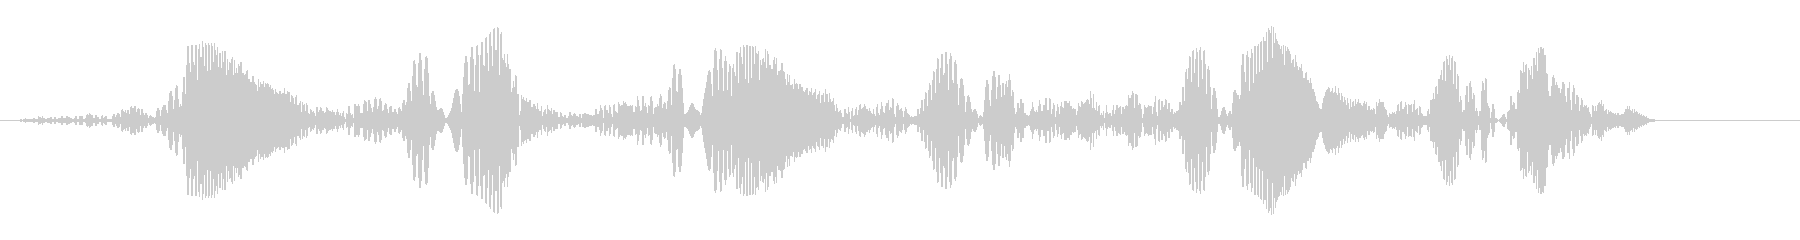 ポワポワポワポワポワポワ(上昇音)の未再生の波形